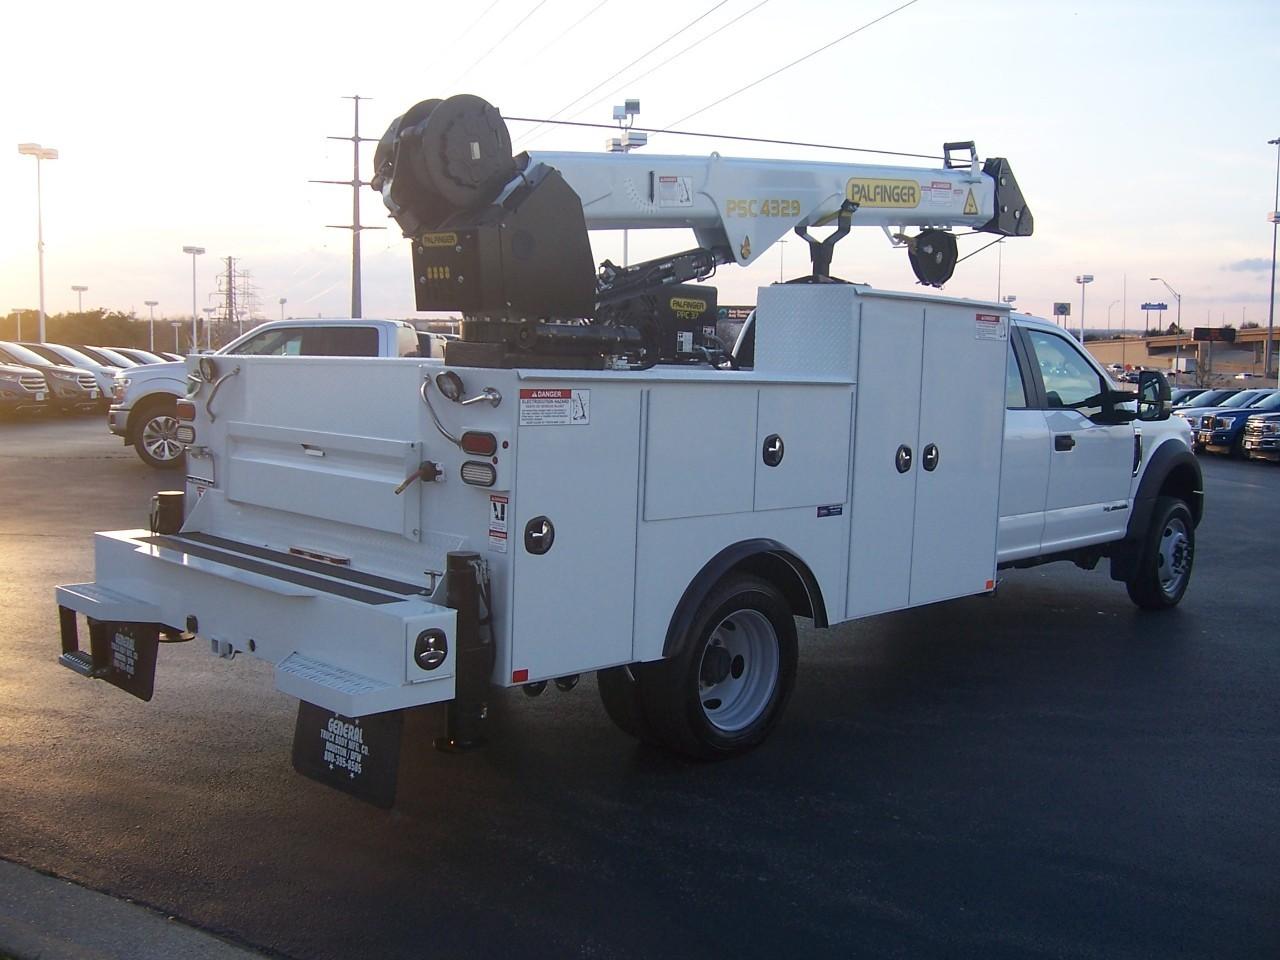 2019 Ford F550, North Richland Hills TX - 112227245 - CommercialTruckTrader.com